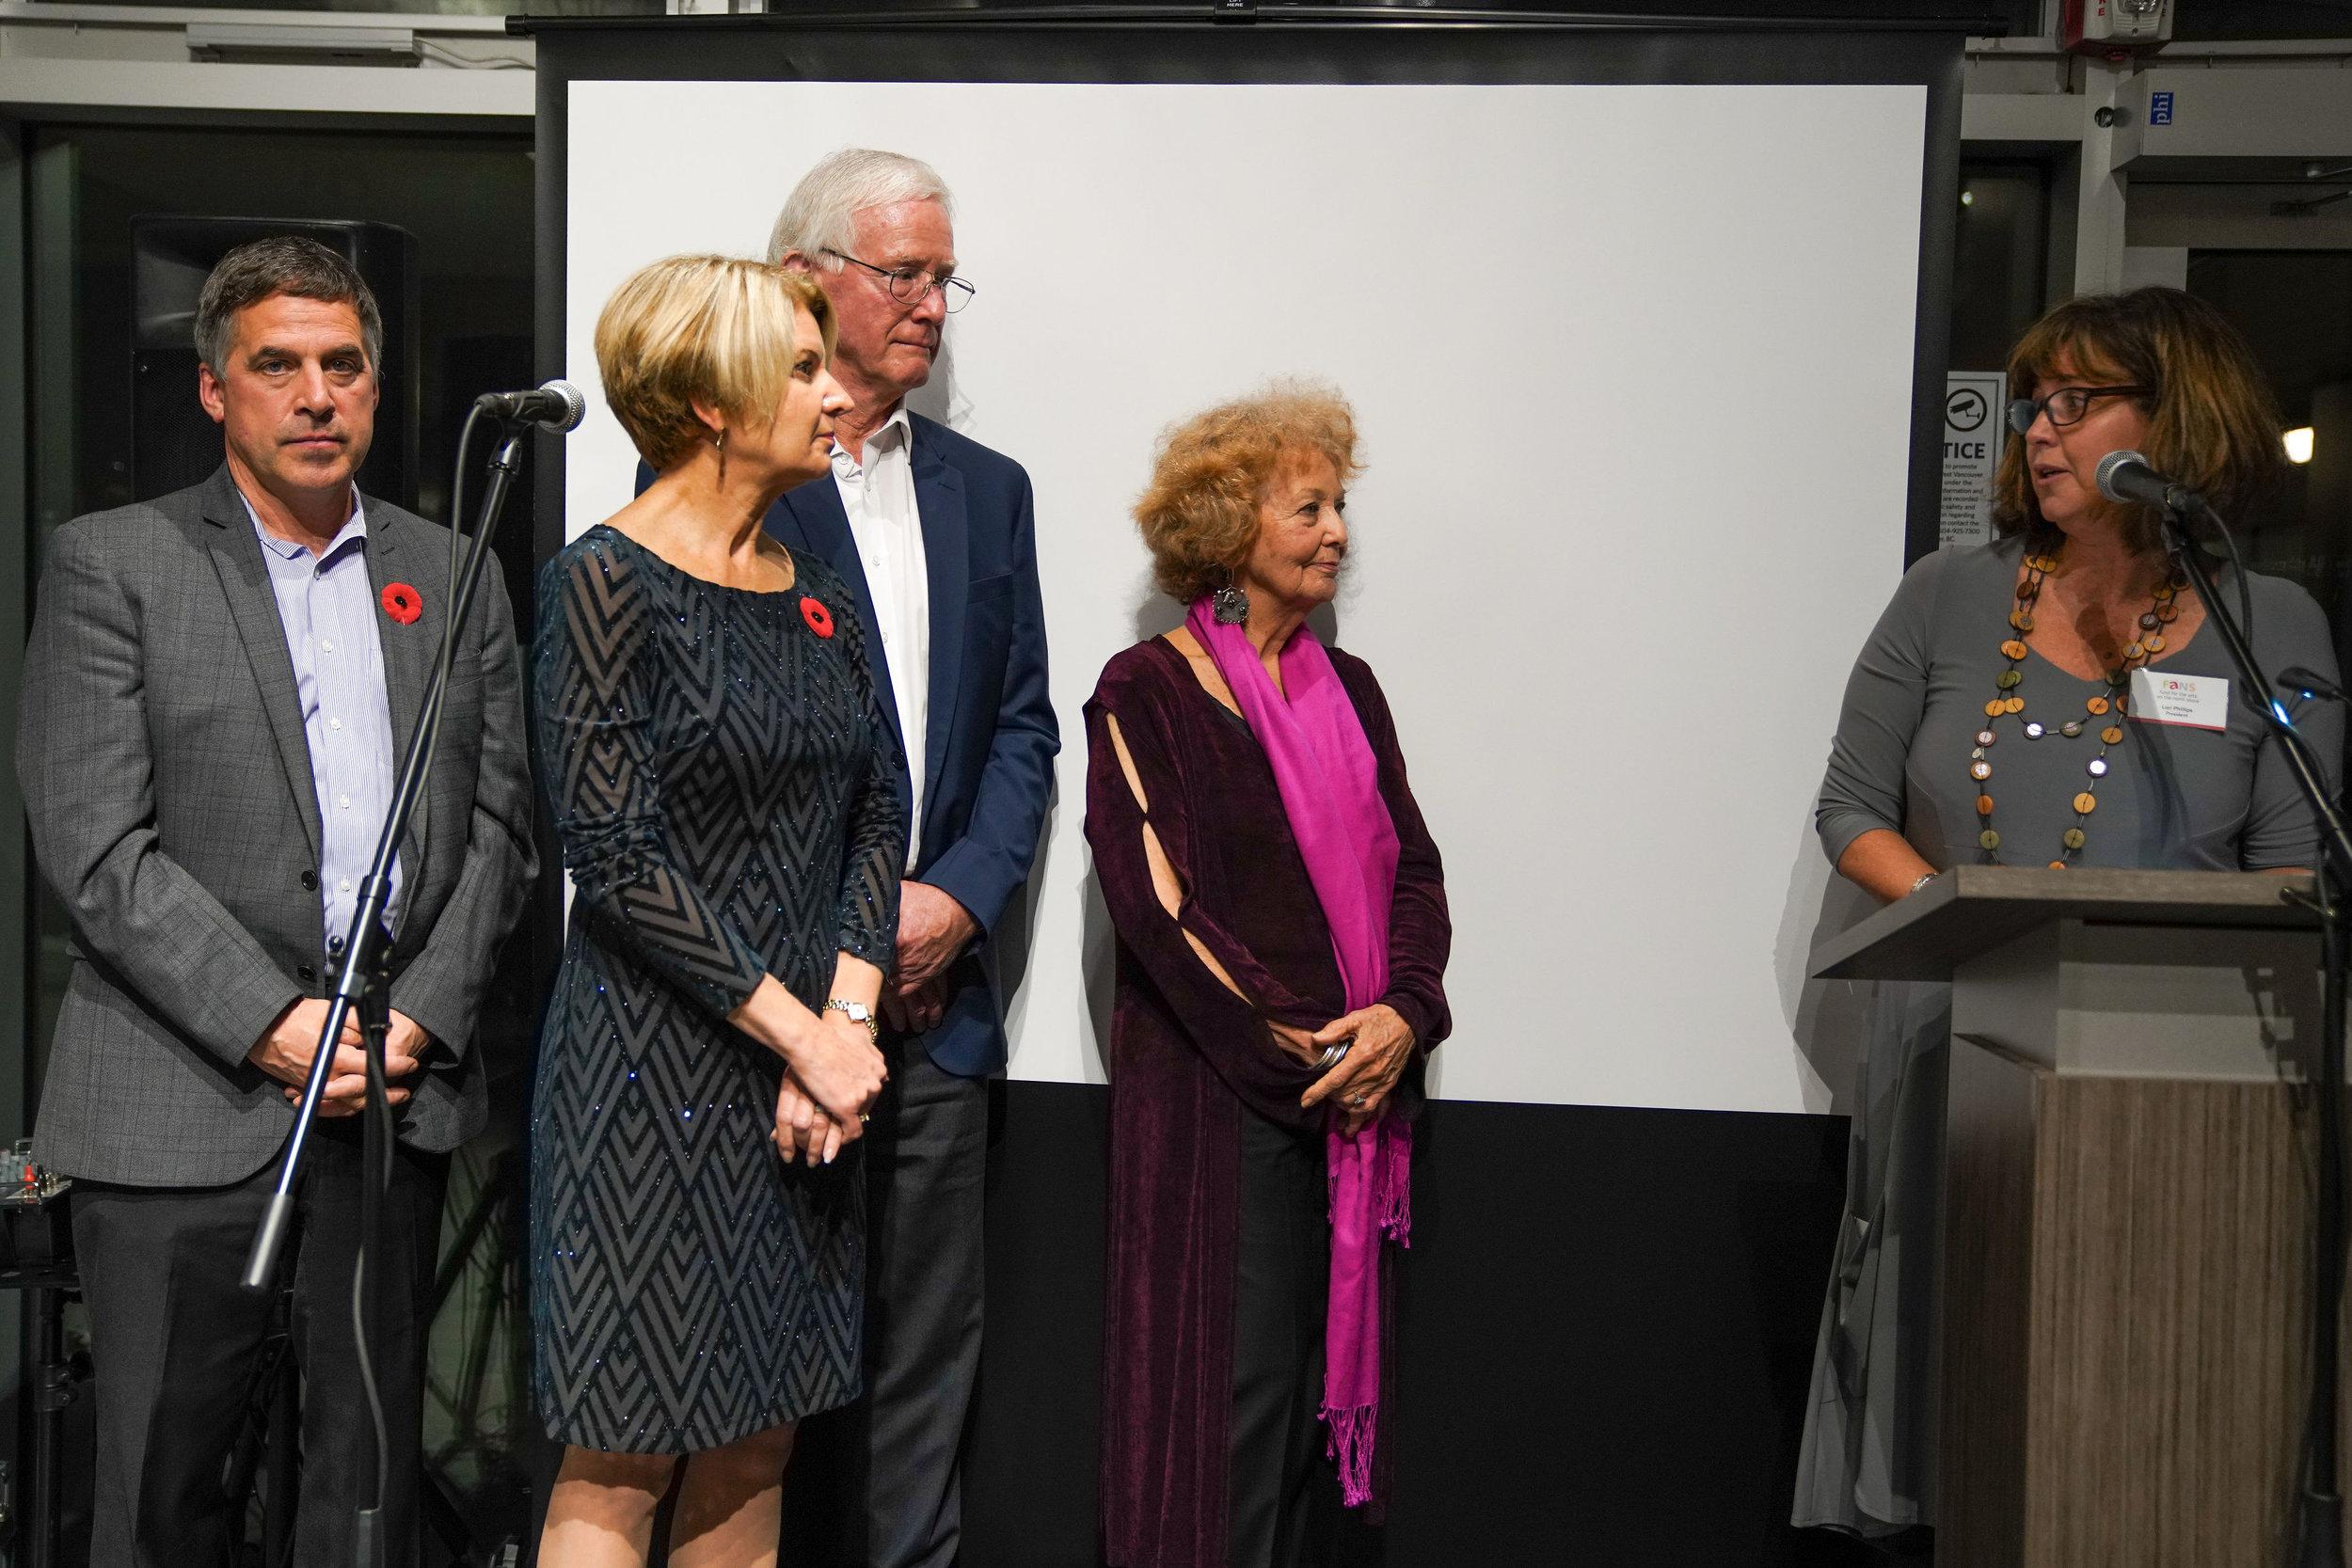 FANS Distinguished Artist Award Sylvia Tait, (Visual Arts)  LR: Mayor Mussatto, new mayor Mary-Ann Booth, Mayor Walton, Sylvia Tait, and Lori Phillips FANS President